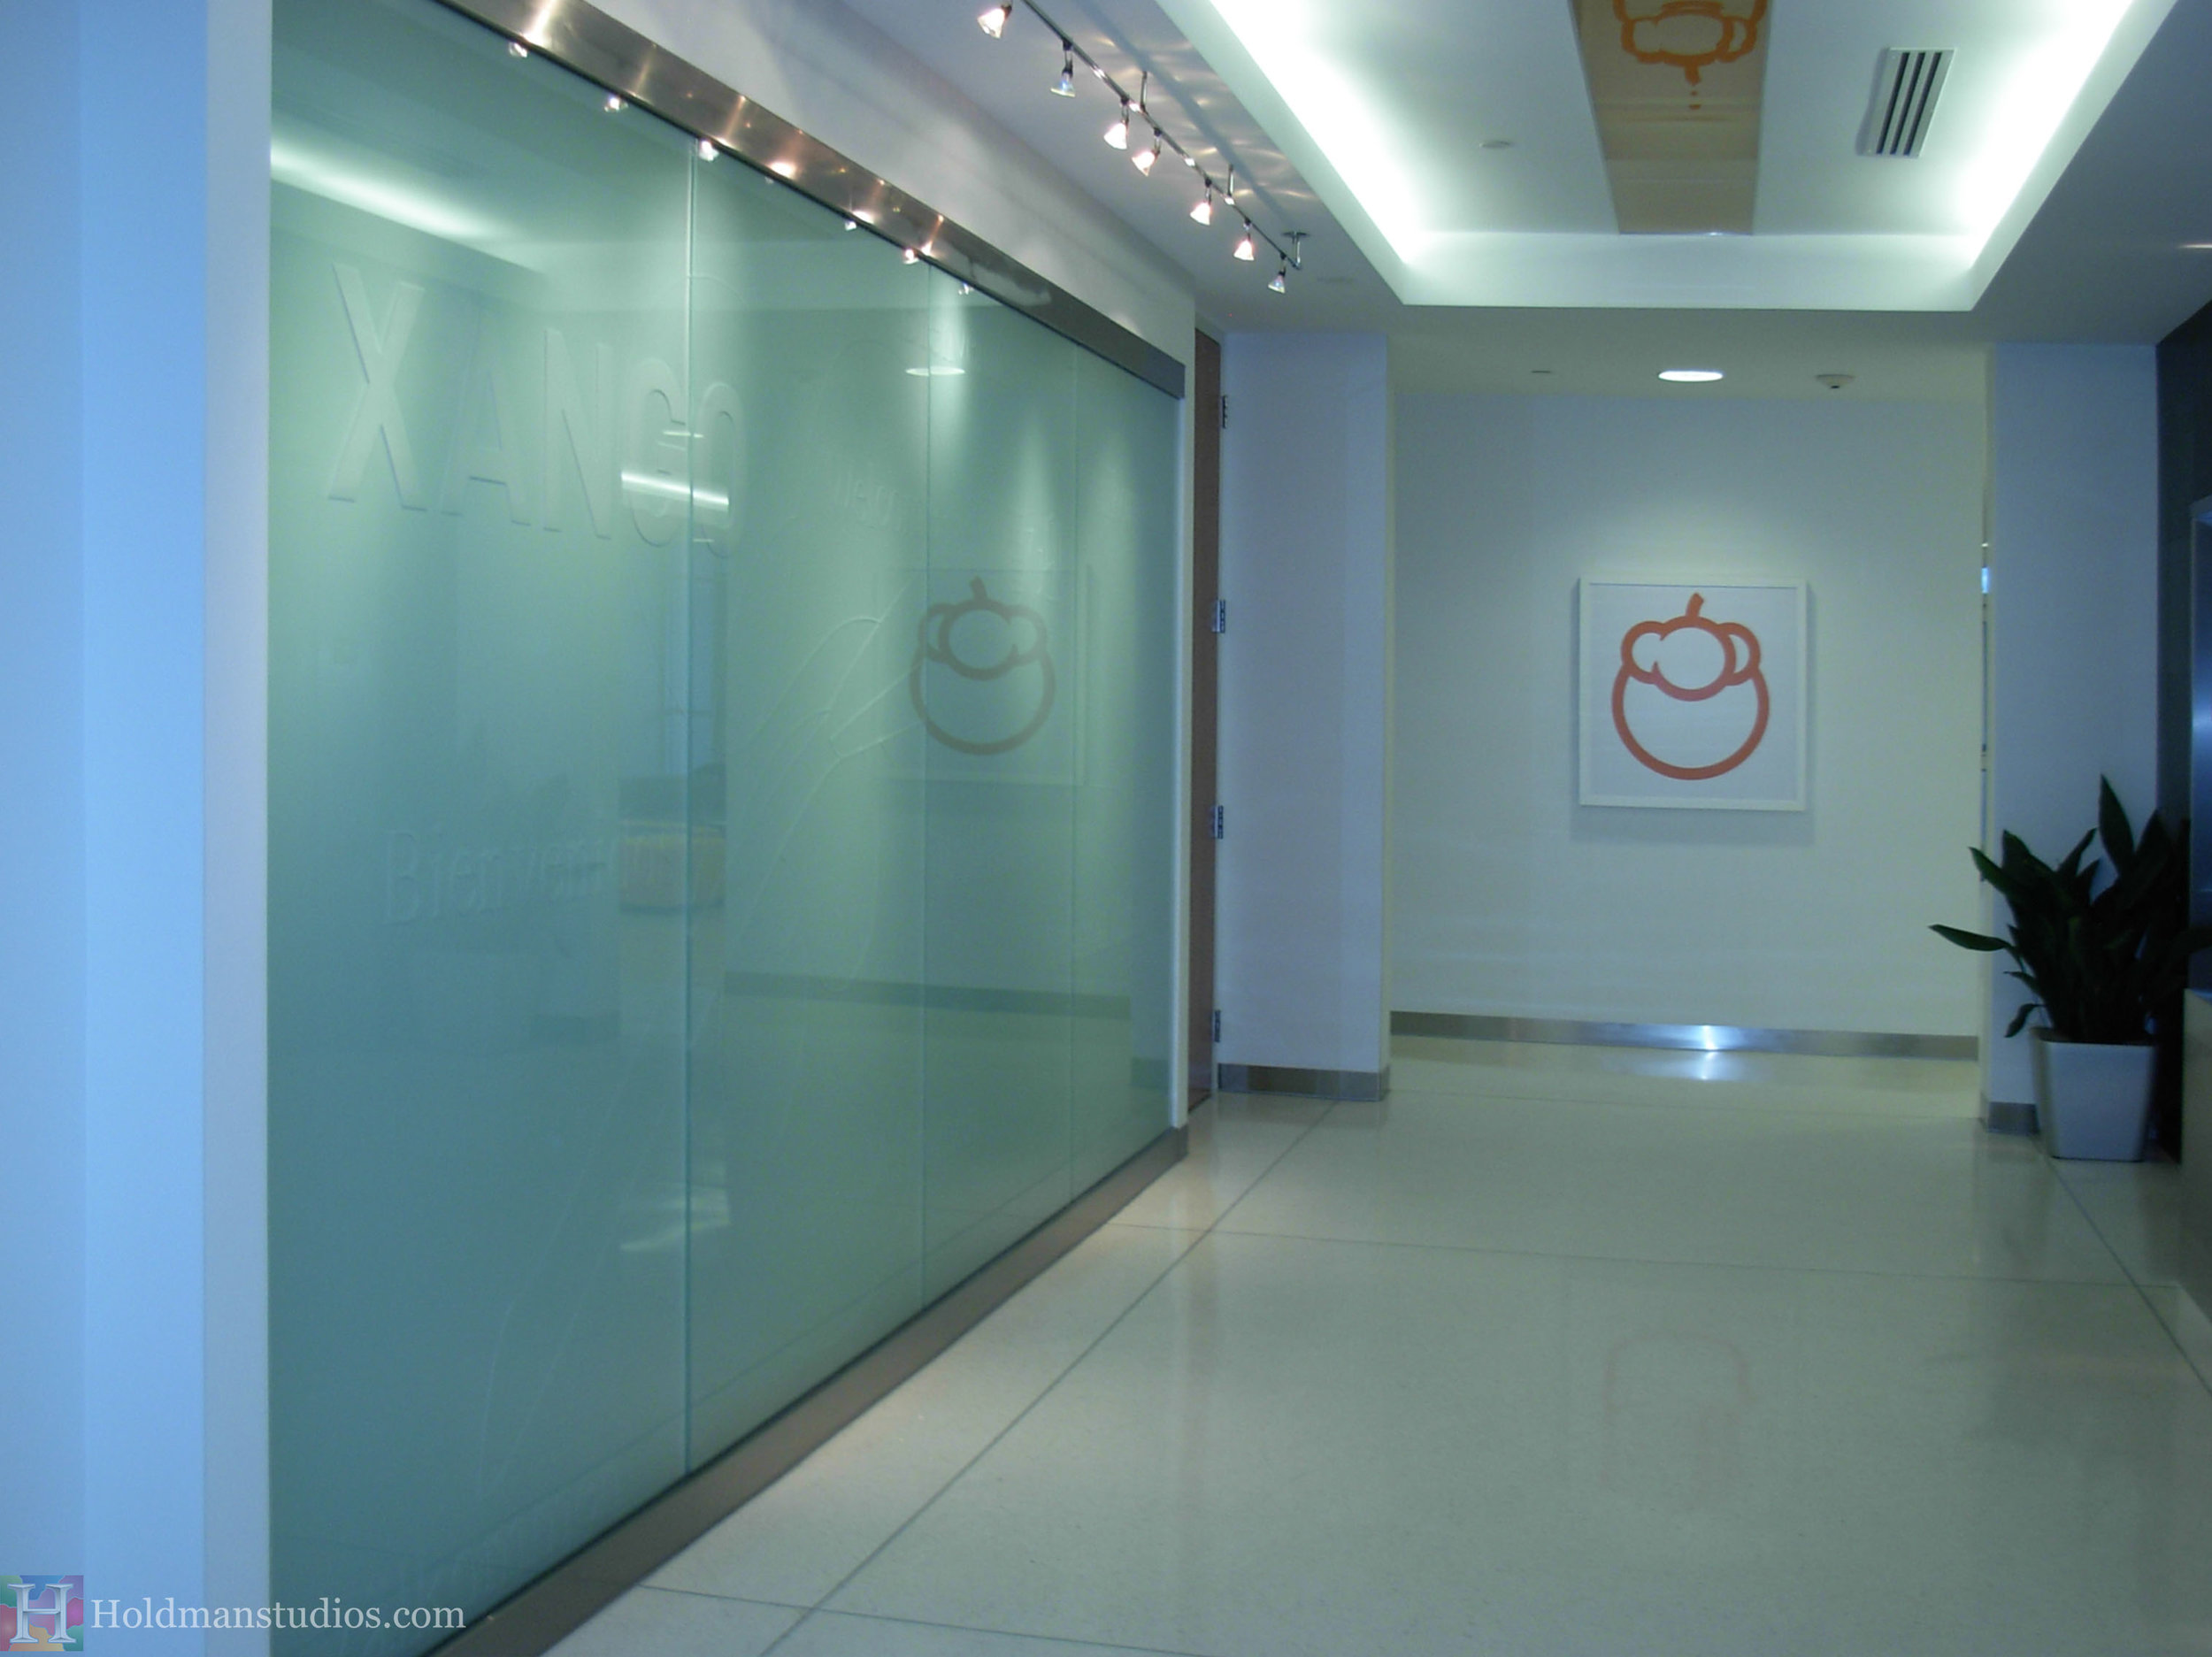 Holdman-studios-etched-art-glass-Xango-wall.jpg